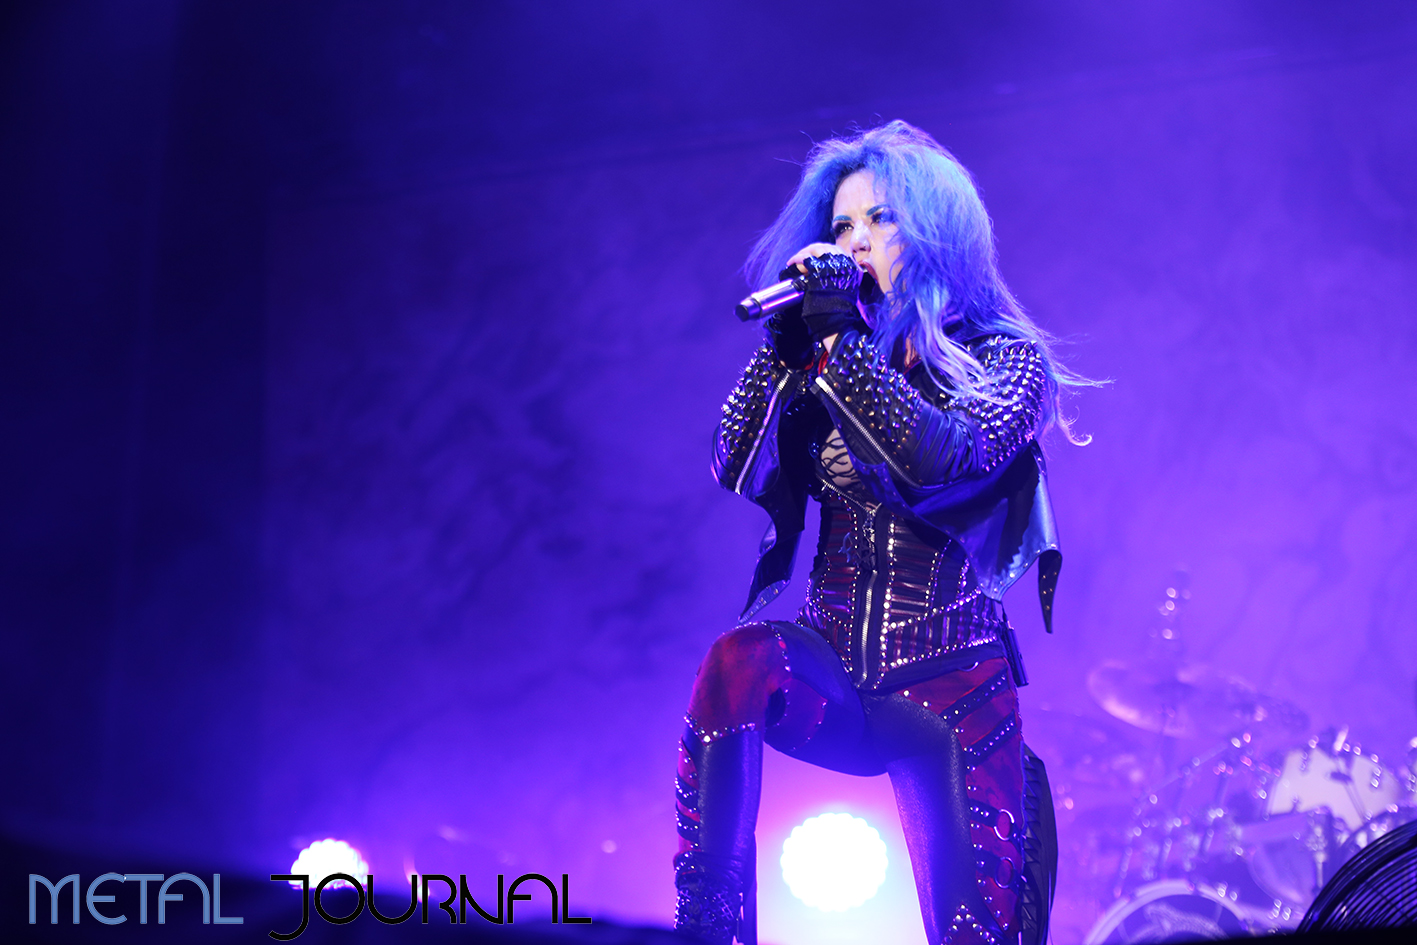 arch enemy - metal journal rock fest barcelona 2019 pic 11